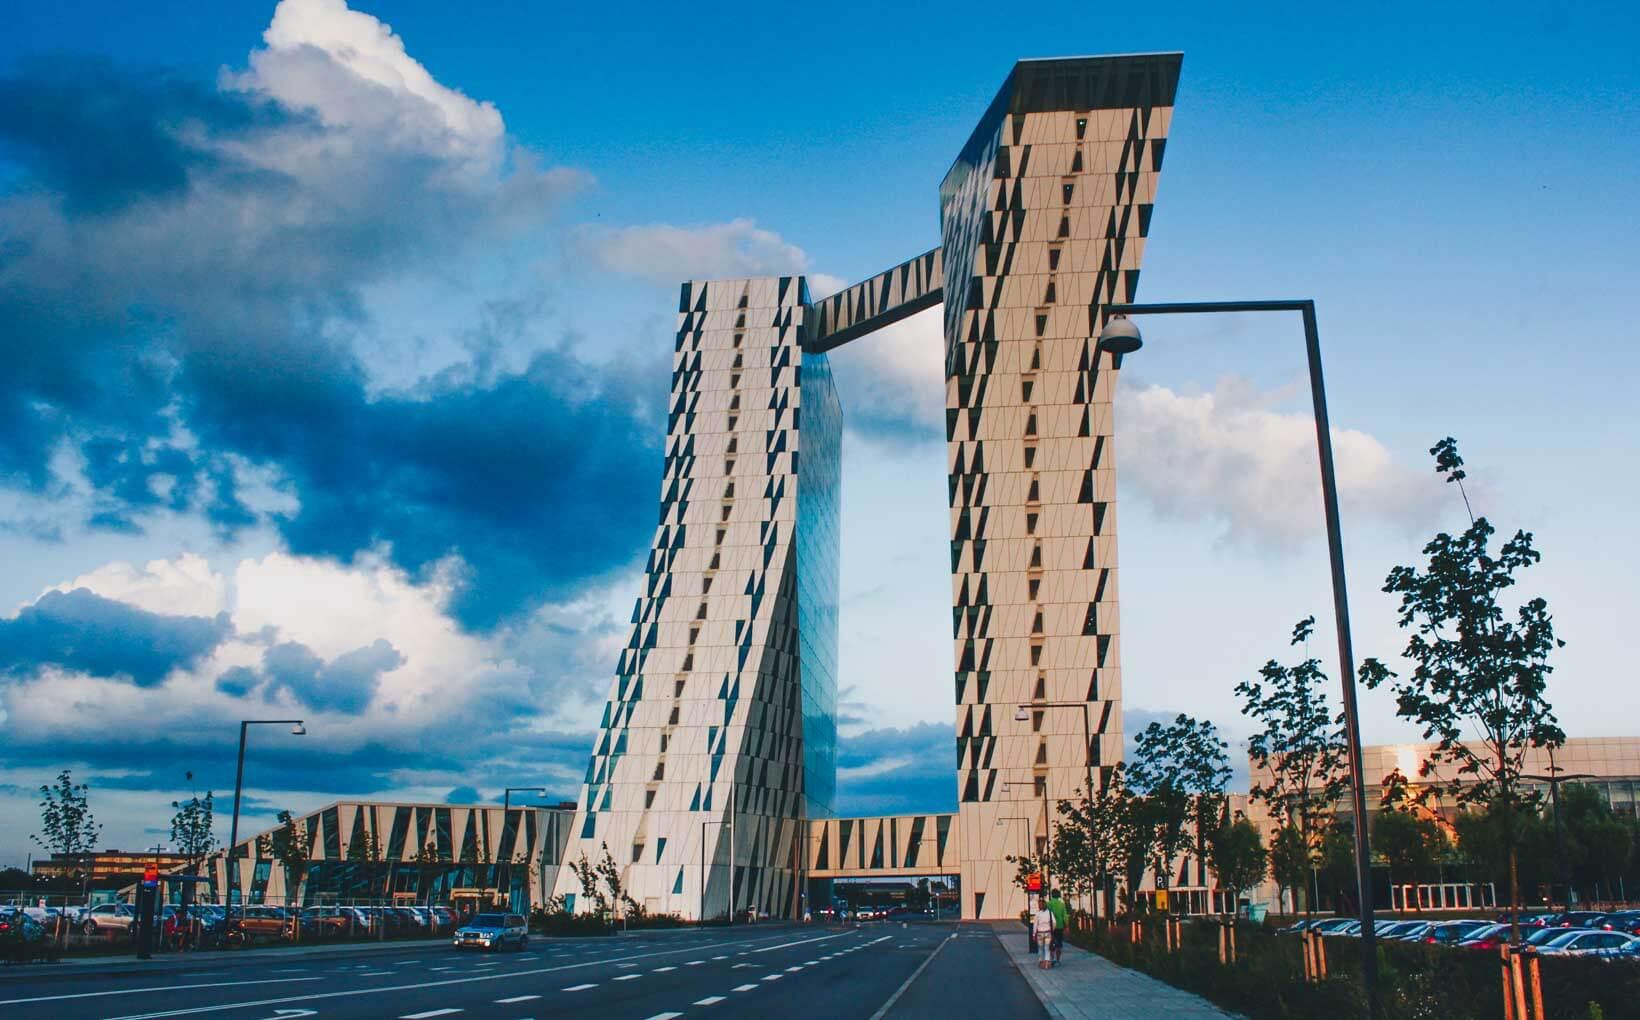 Orestad, Comprehensive Guide to Copenhagen On a Budget